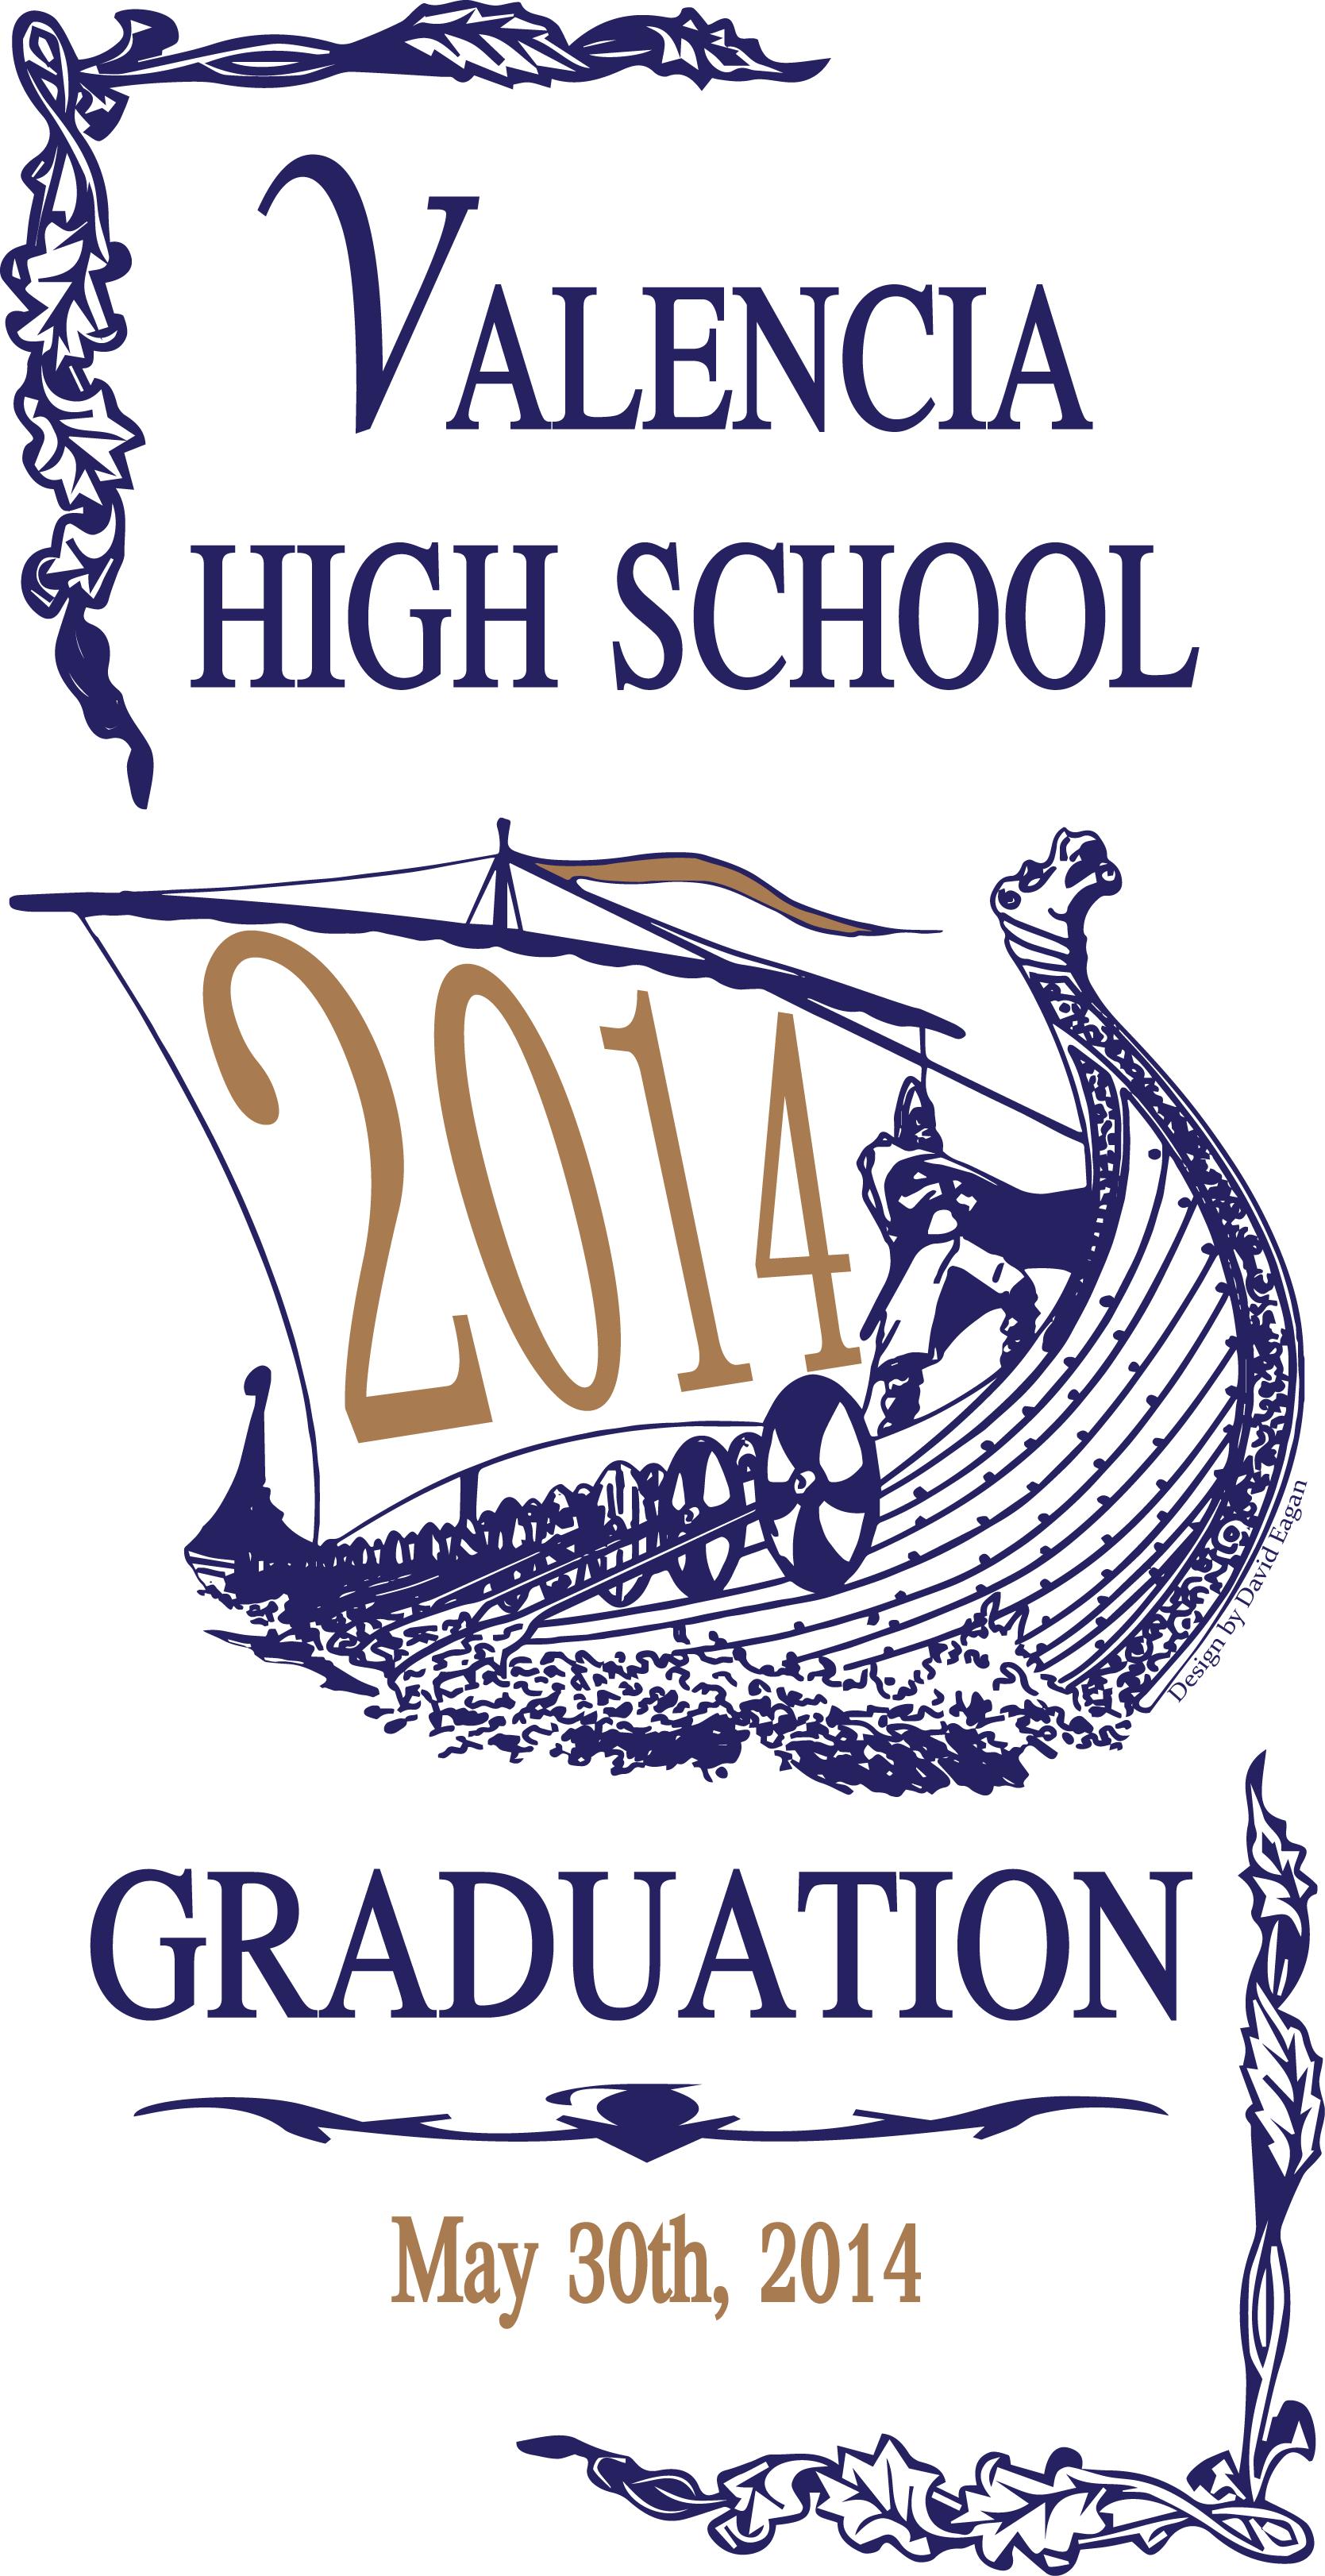 2014 program cover by David Eagan